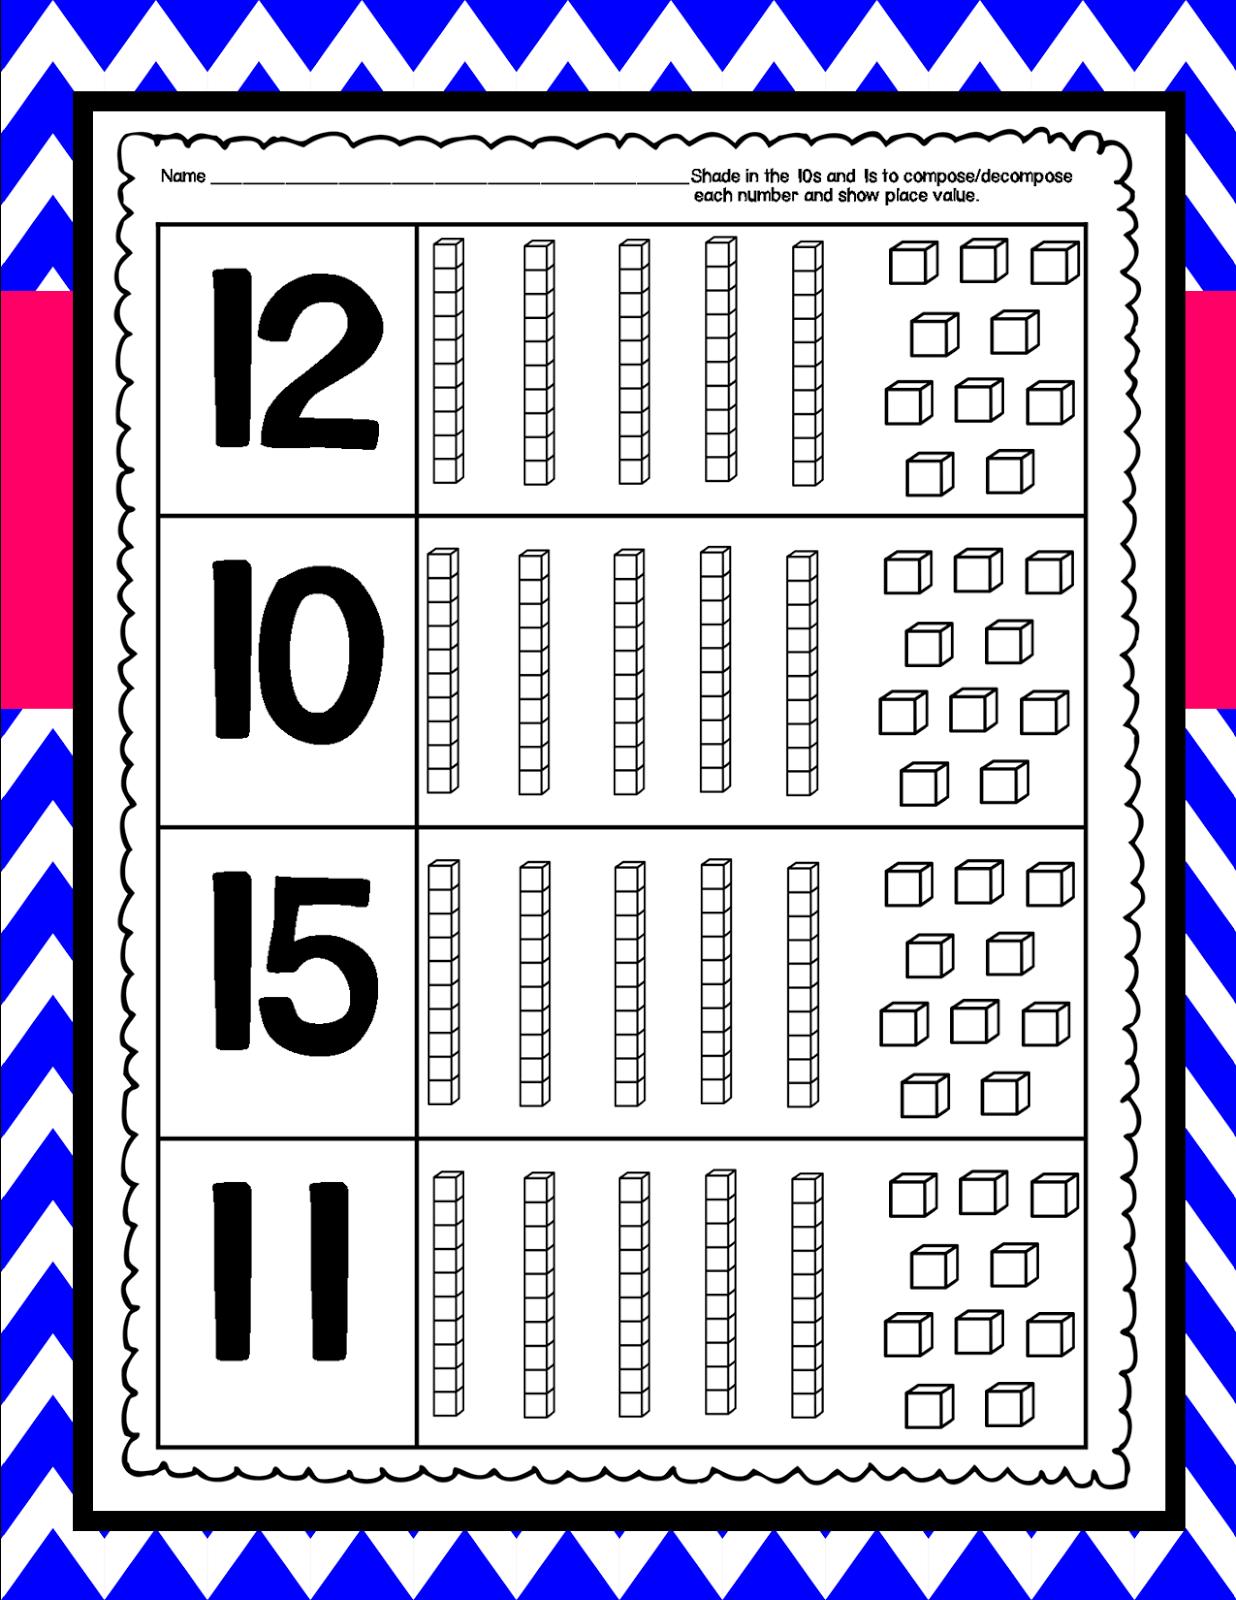 kindergarten squared compose decompose numbers and place value. Black Bedroom Furniture Sets. Home Design Ideas